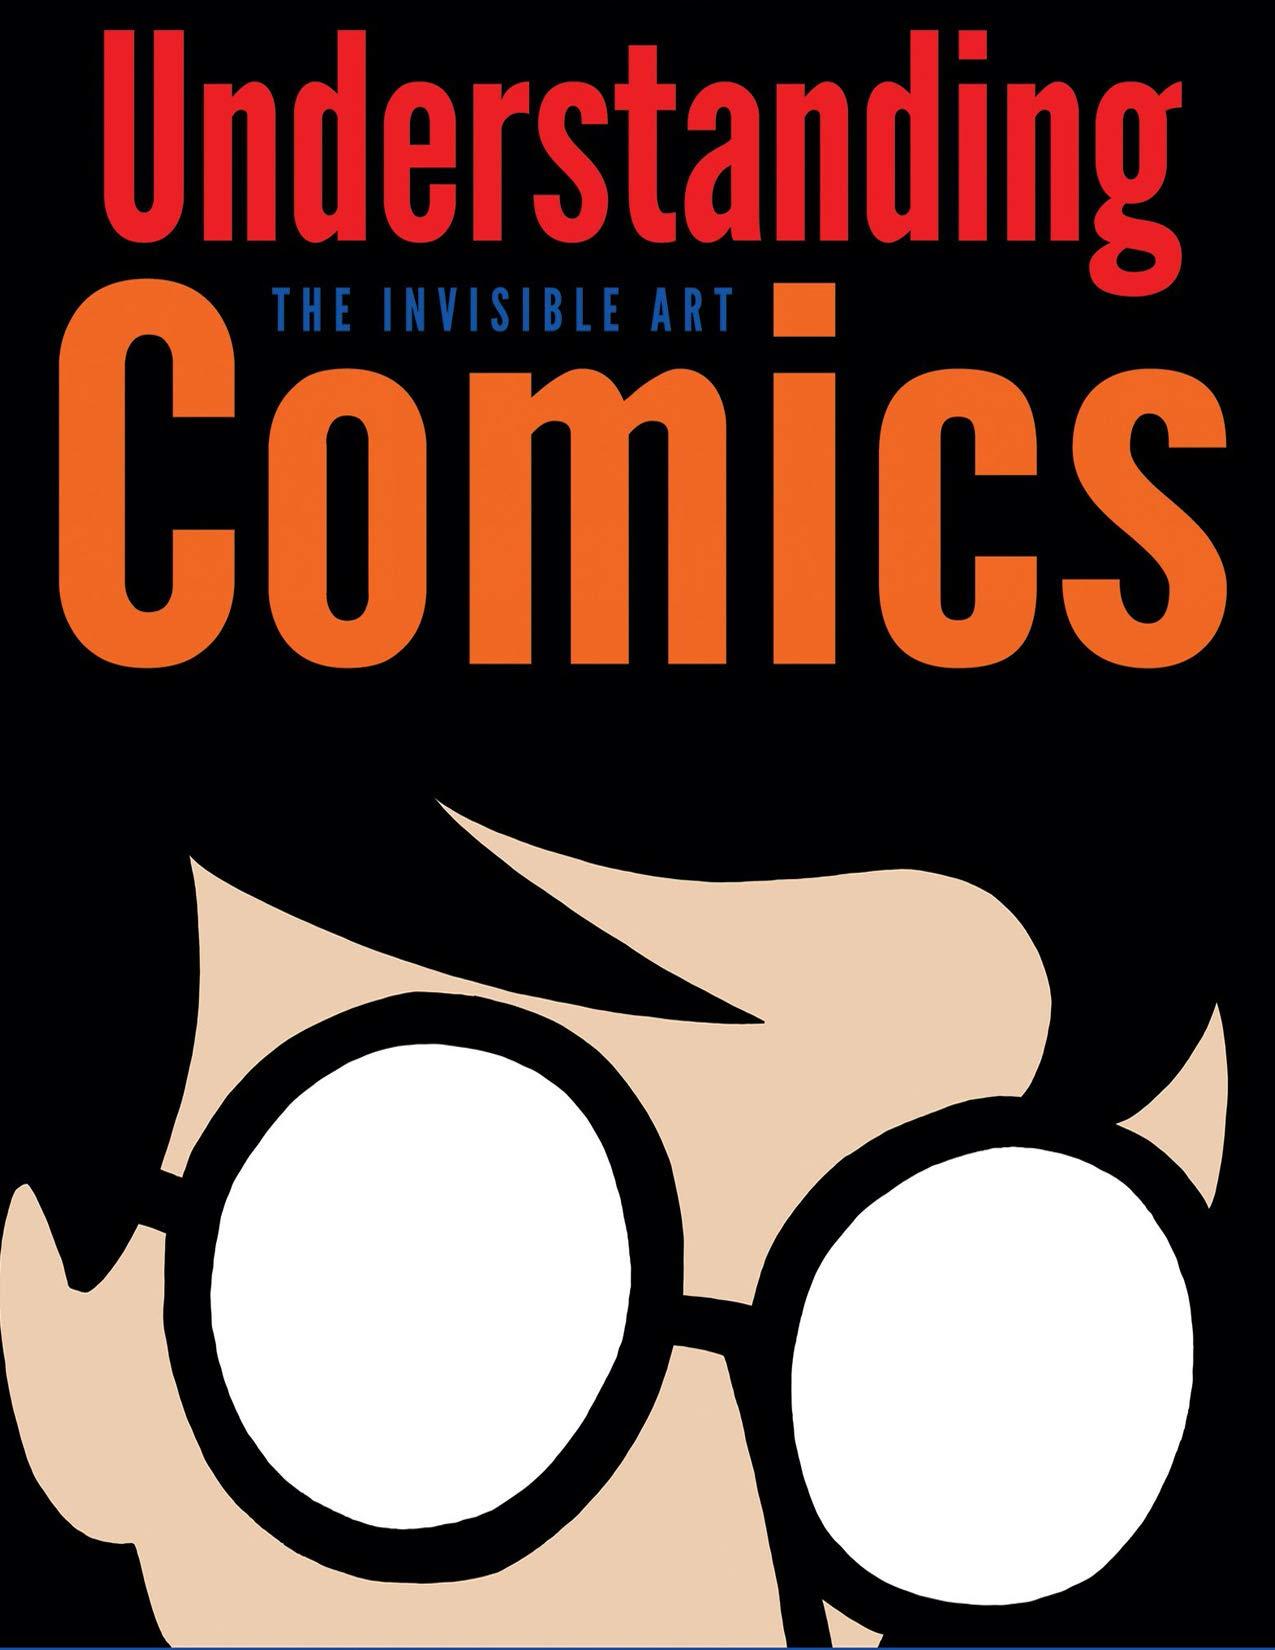 Understanding Comics: Understanding Comics The Invisible Art kindle comic book version